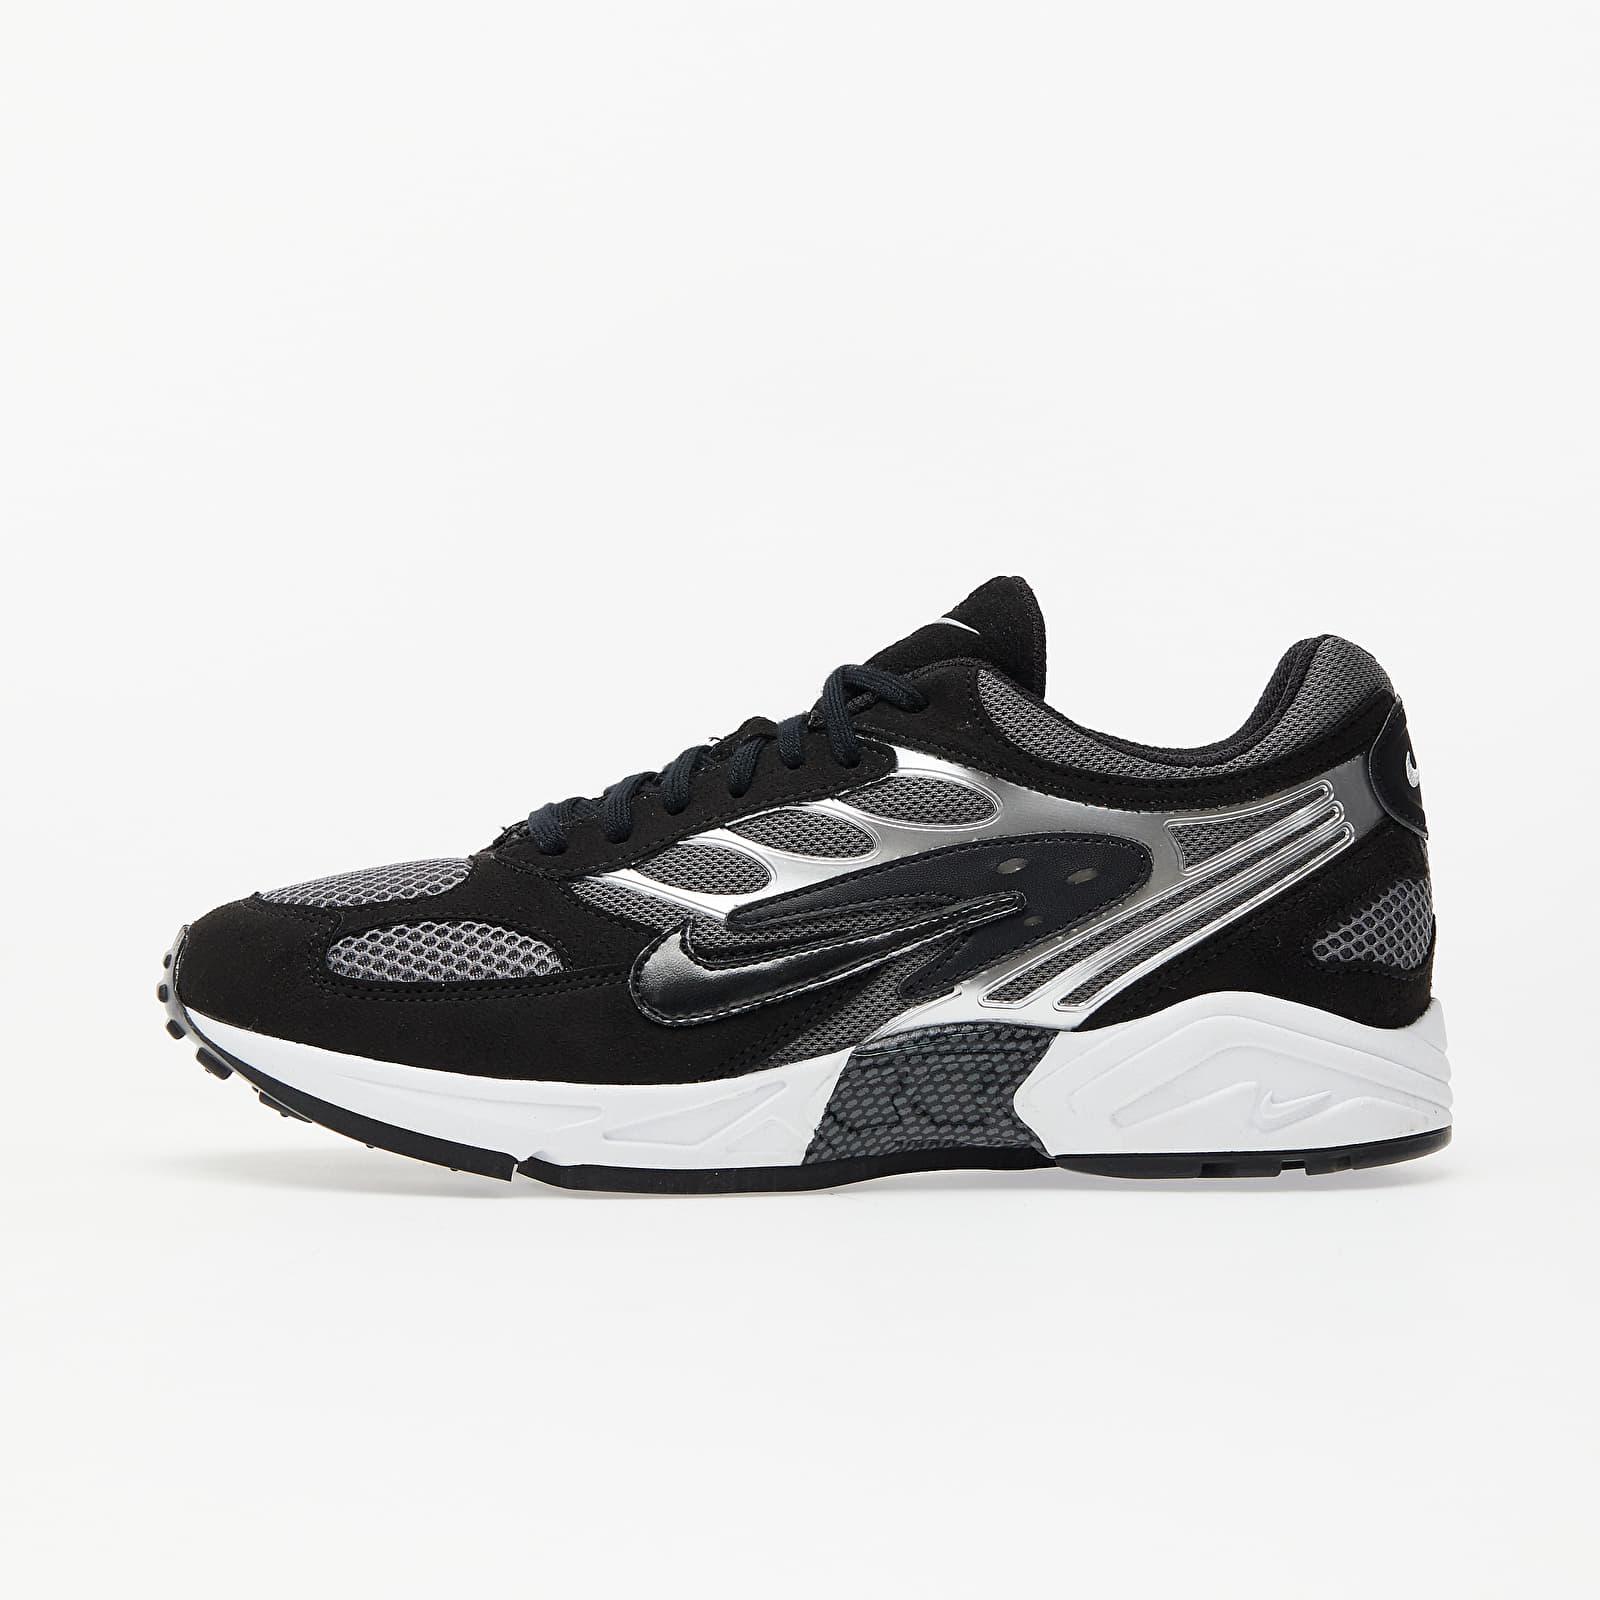 Nike Air Ghost Racer Black/ Black-Dark Grey-White EUR 40